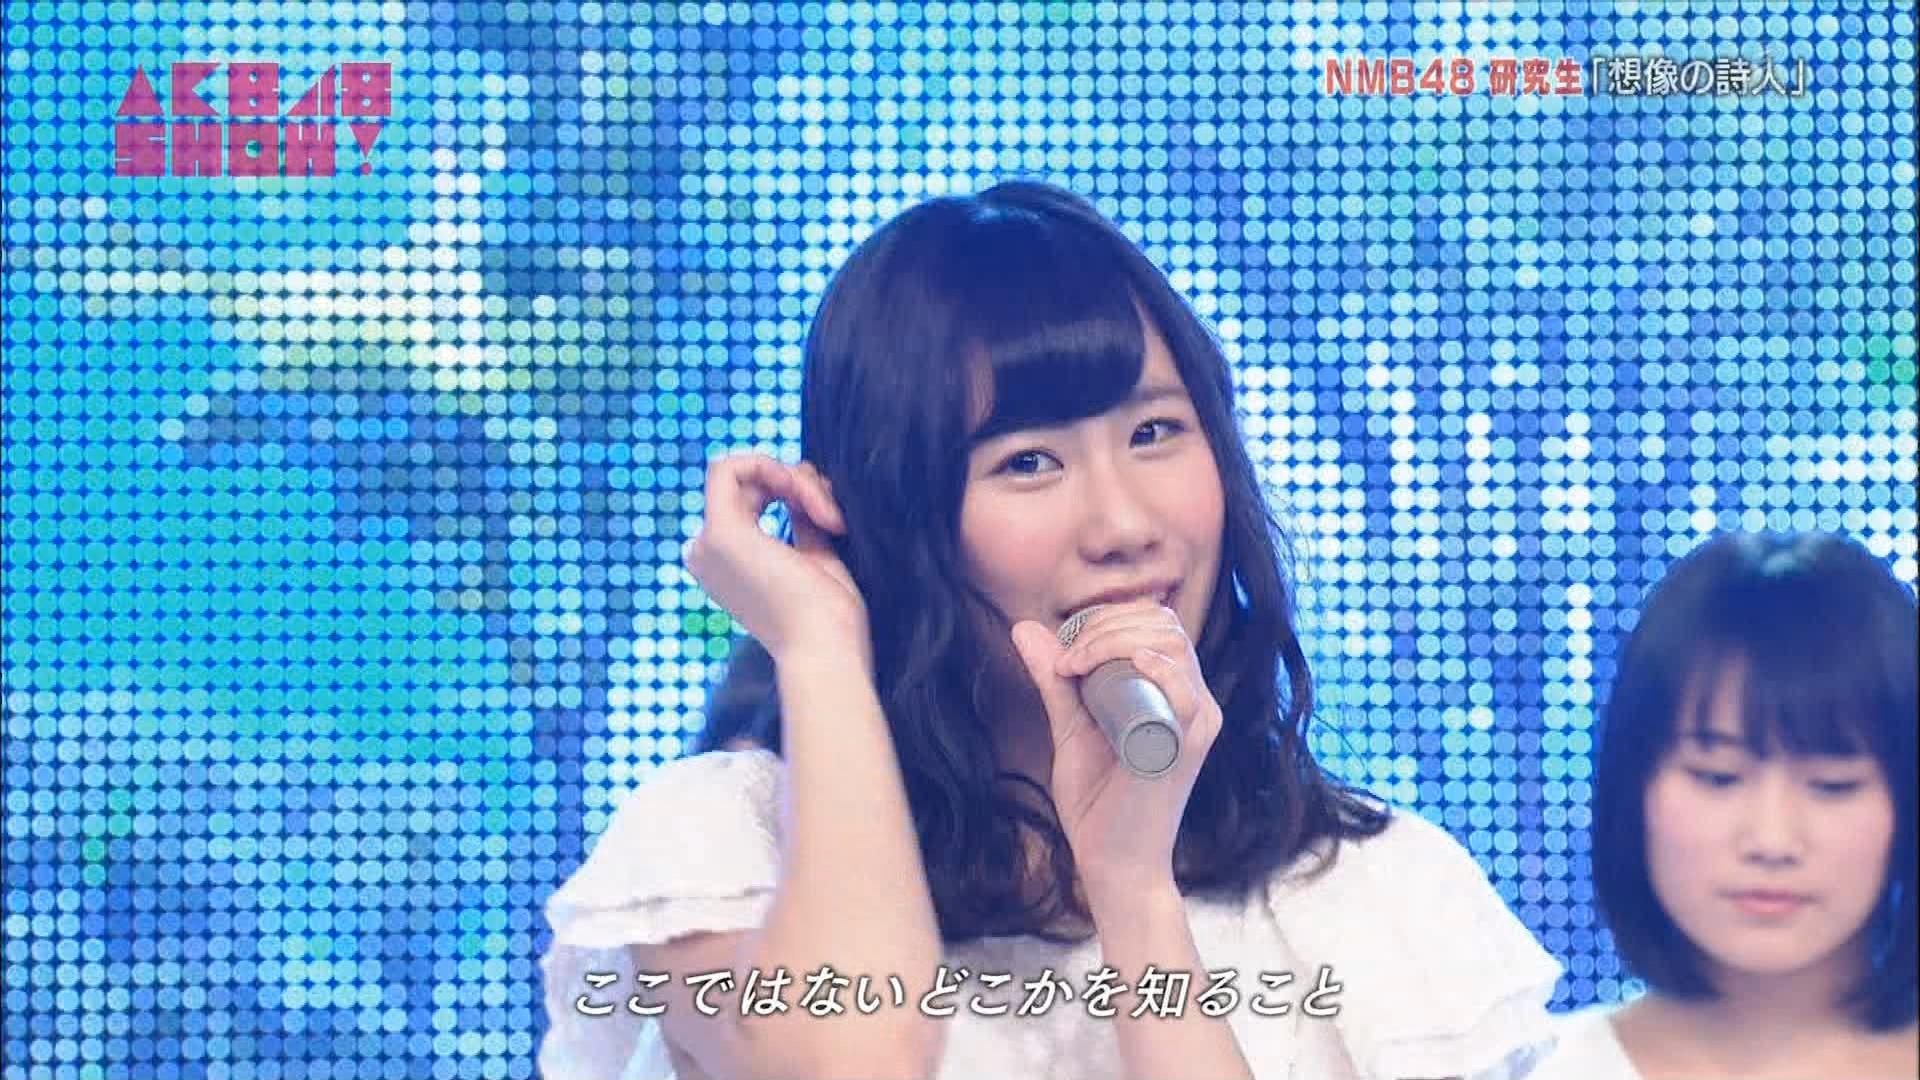 【NMB48】石田優美応援スレ☆10【ゆうみん】 YouTube動画>15本 ->画像>626枚